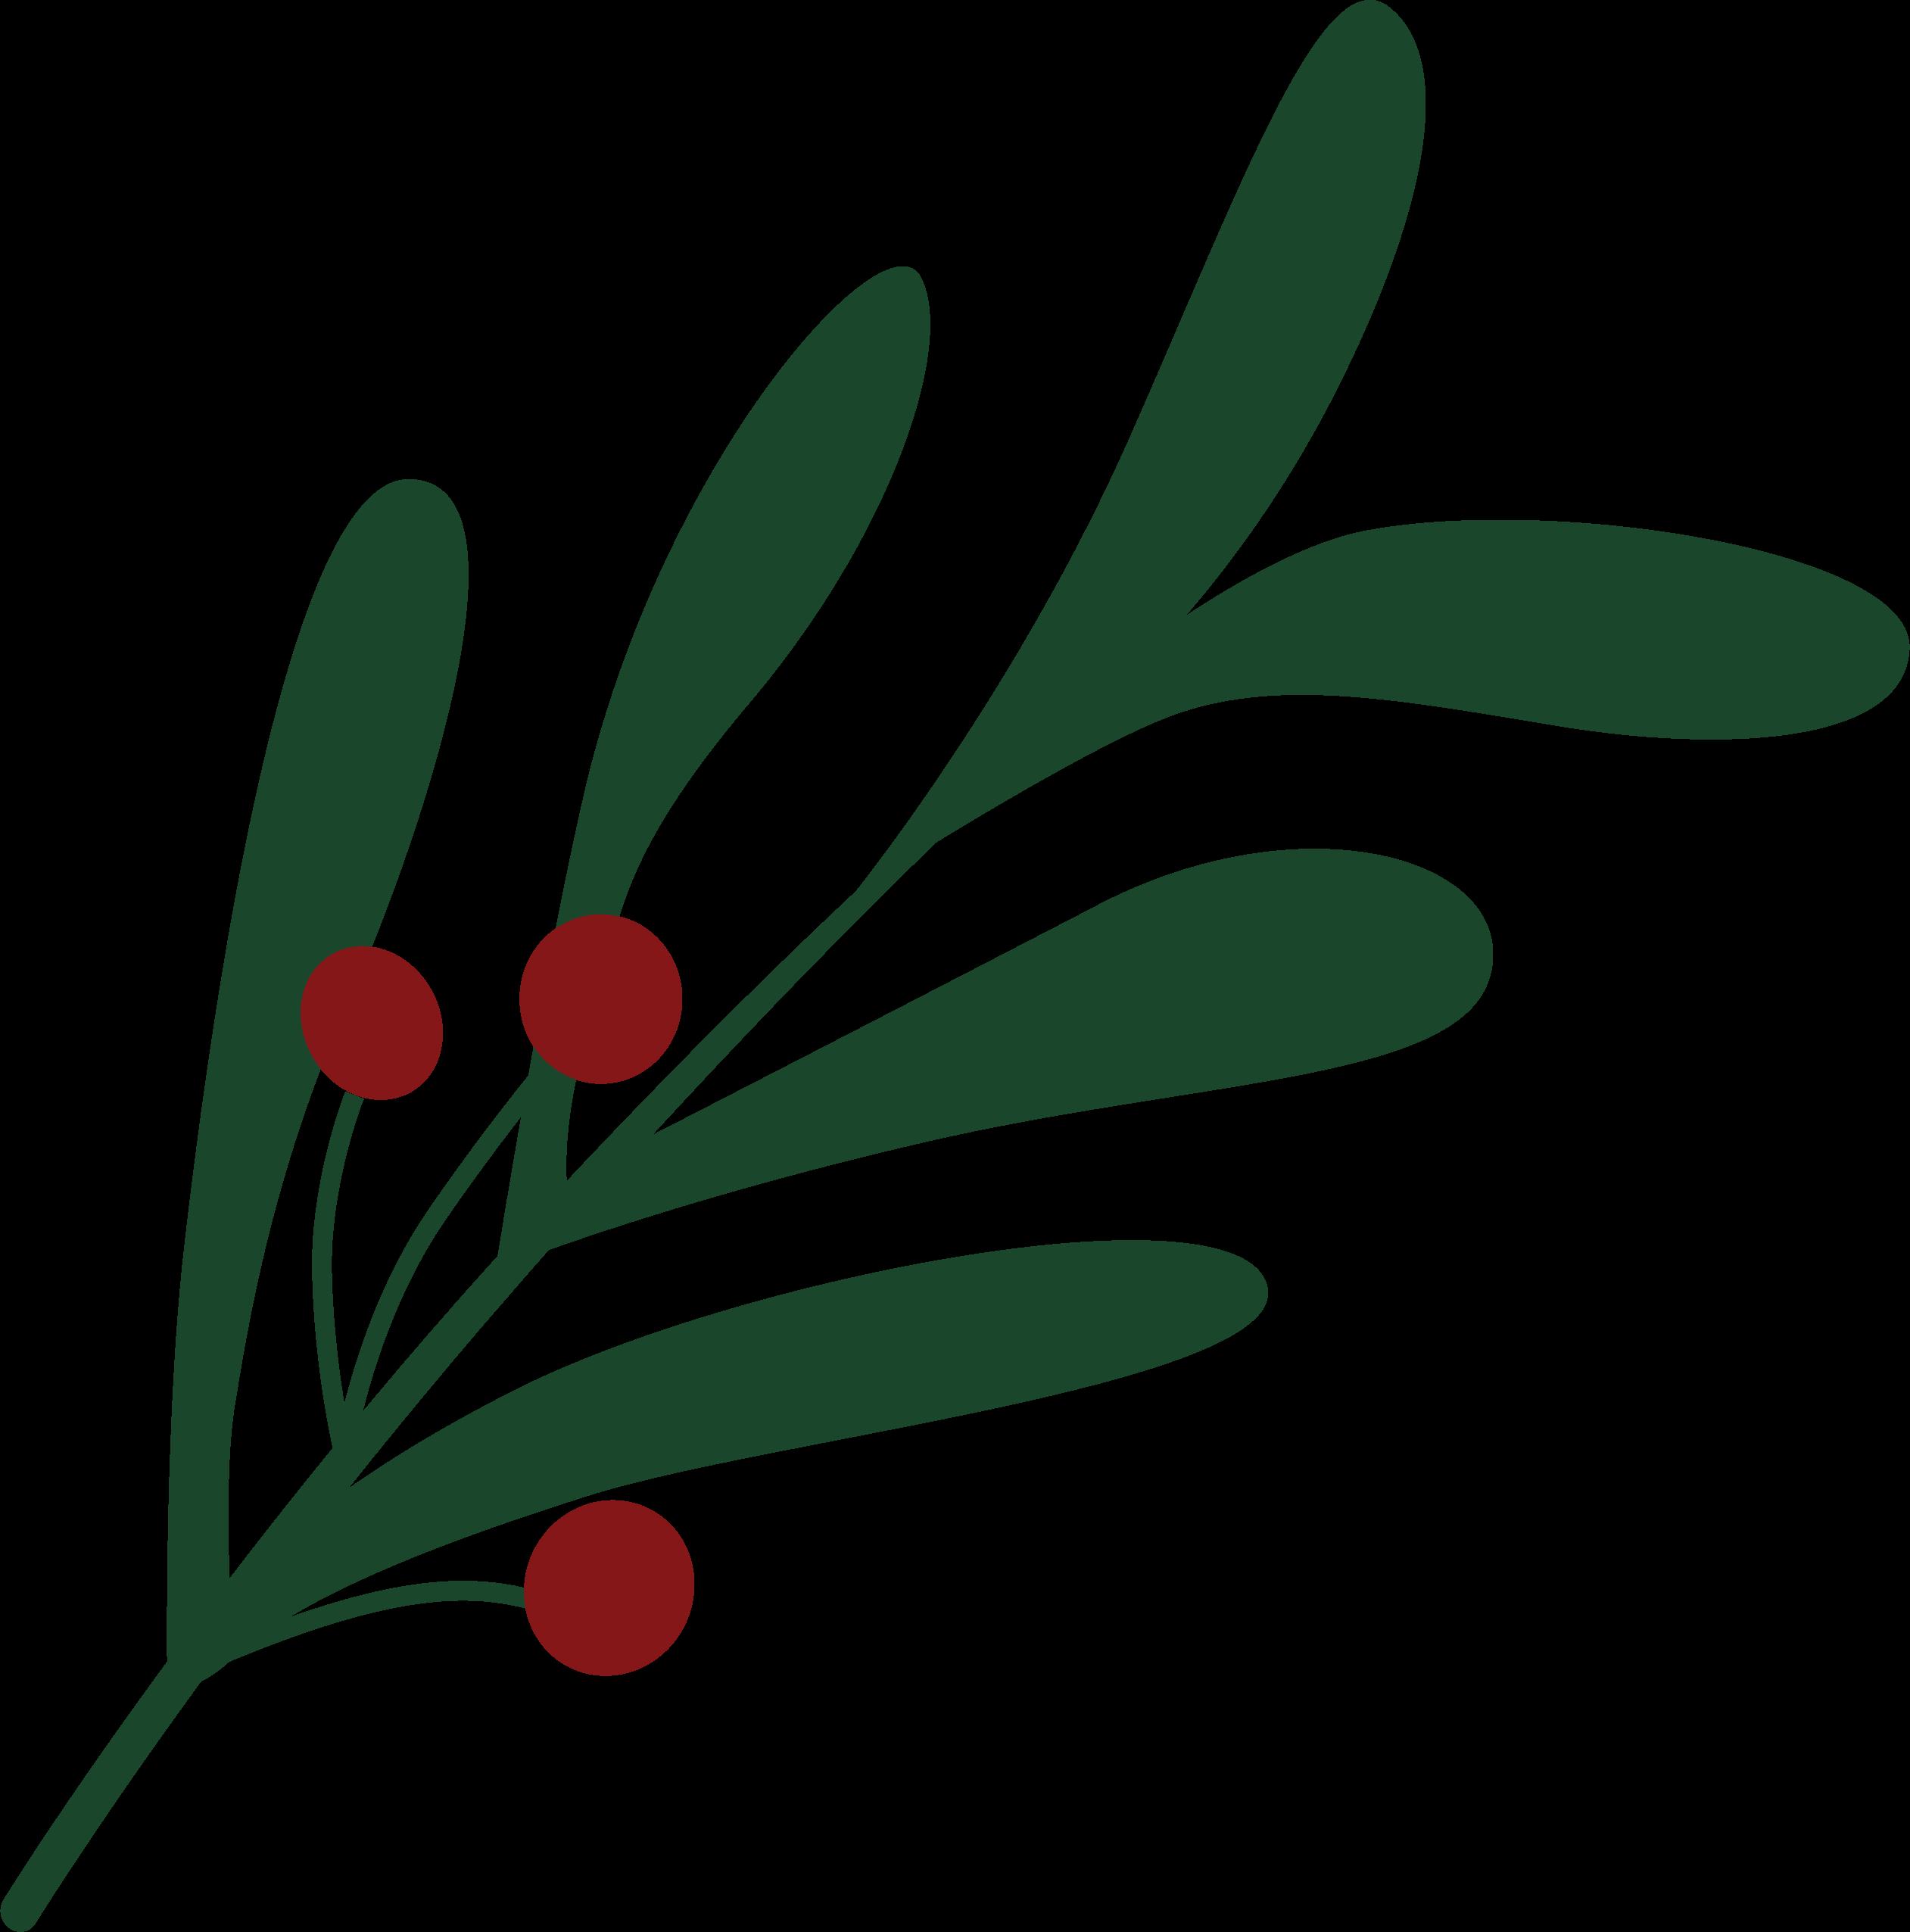 A Cozy Christmas Greenery SVG Cut File